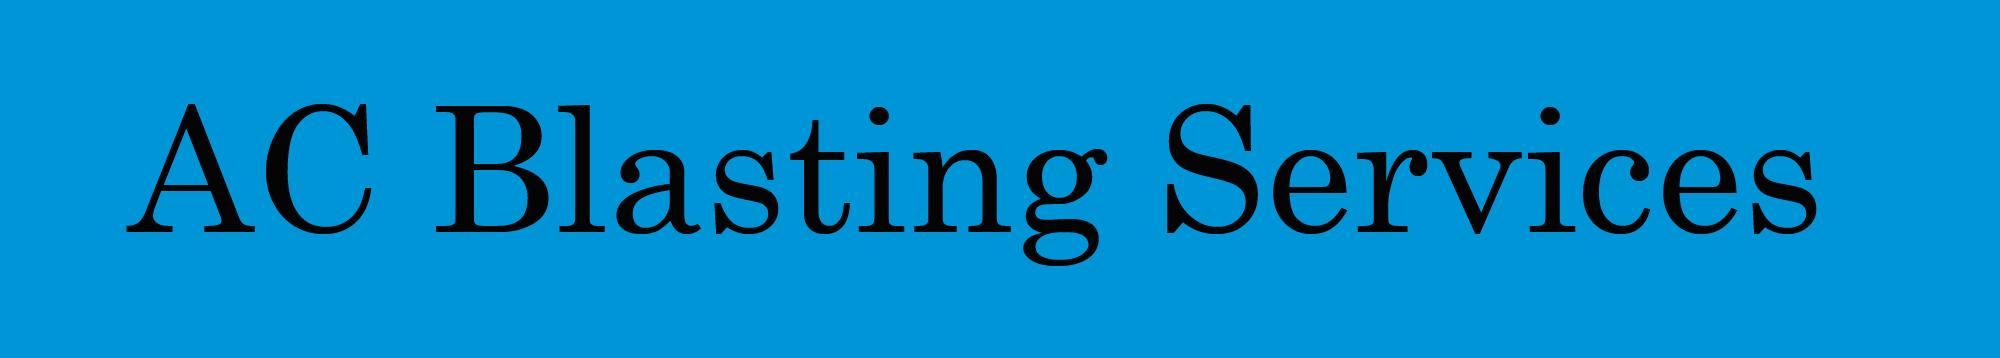 AC Blasting Services